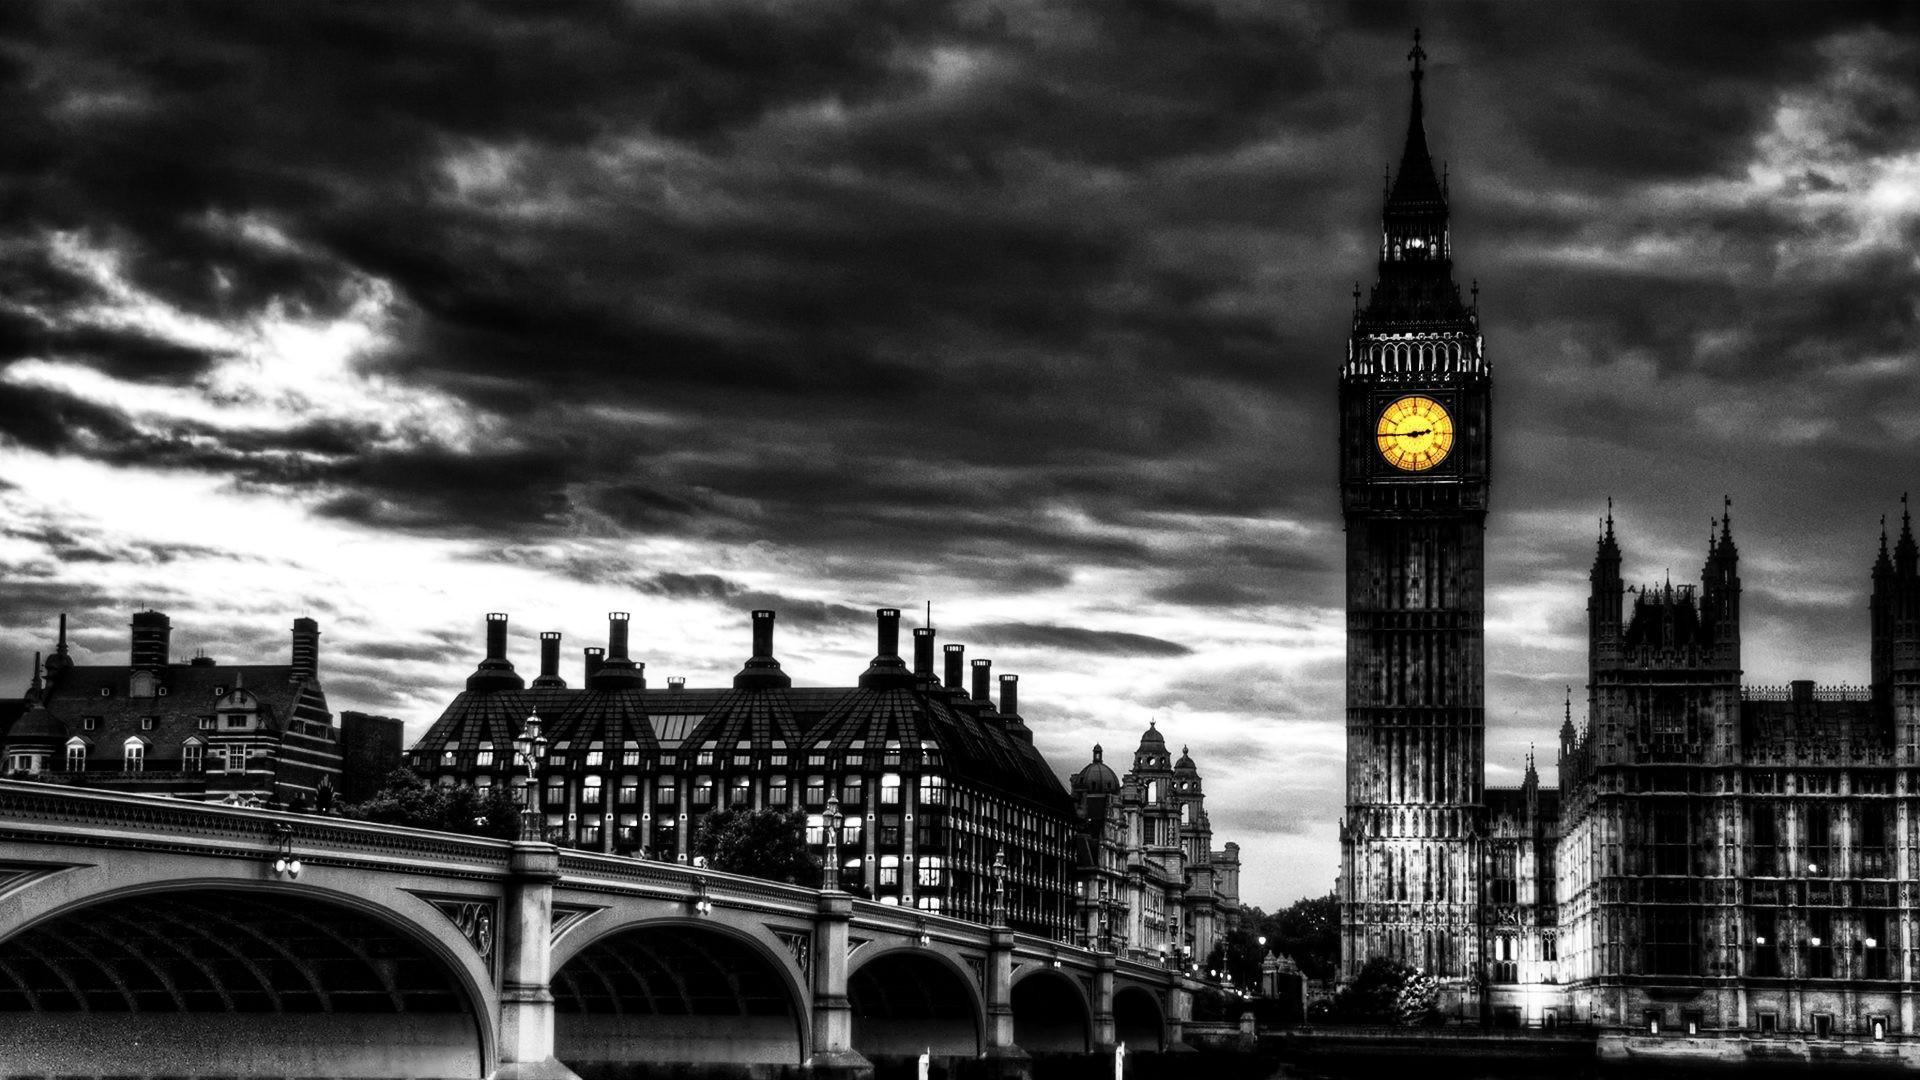 black-and-white-art-dark-Big-Ben-art-Big-Ben-black-1920%C3%971080-London-Black-And-White-W-wallpaper-wp3603361